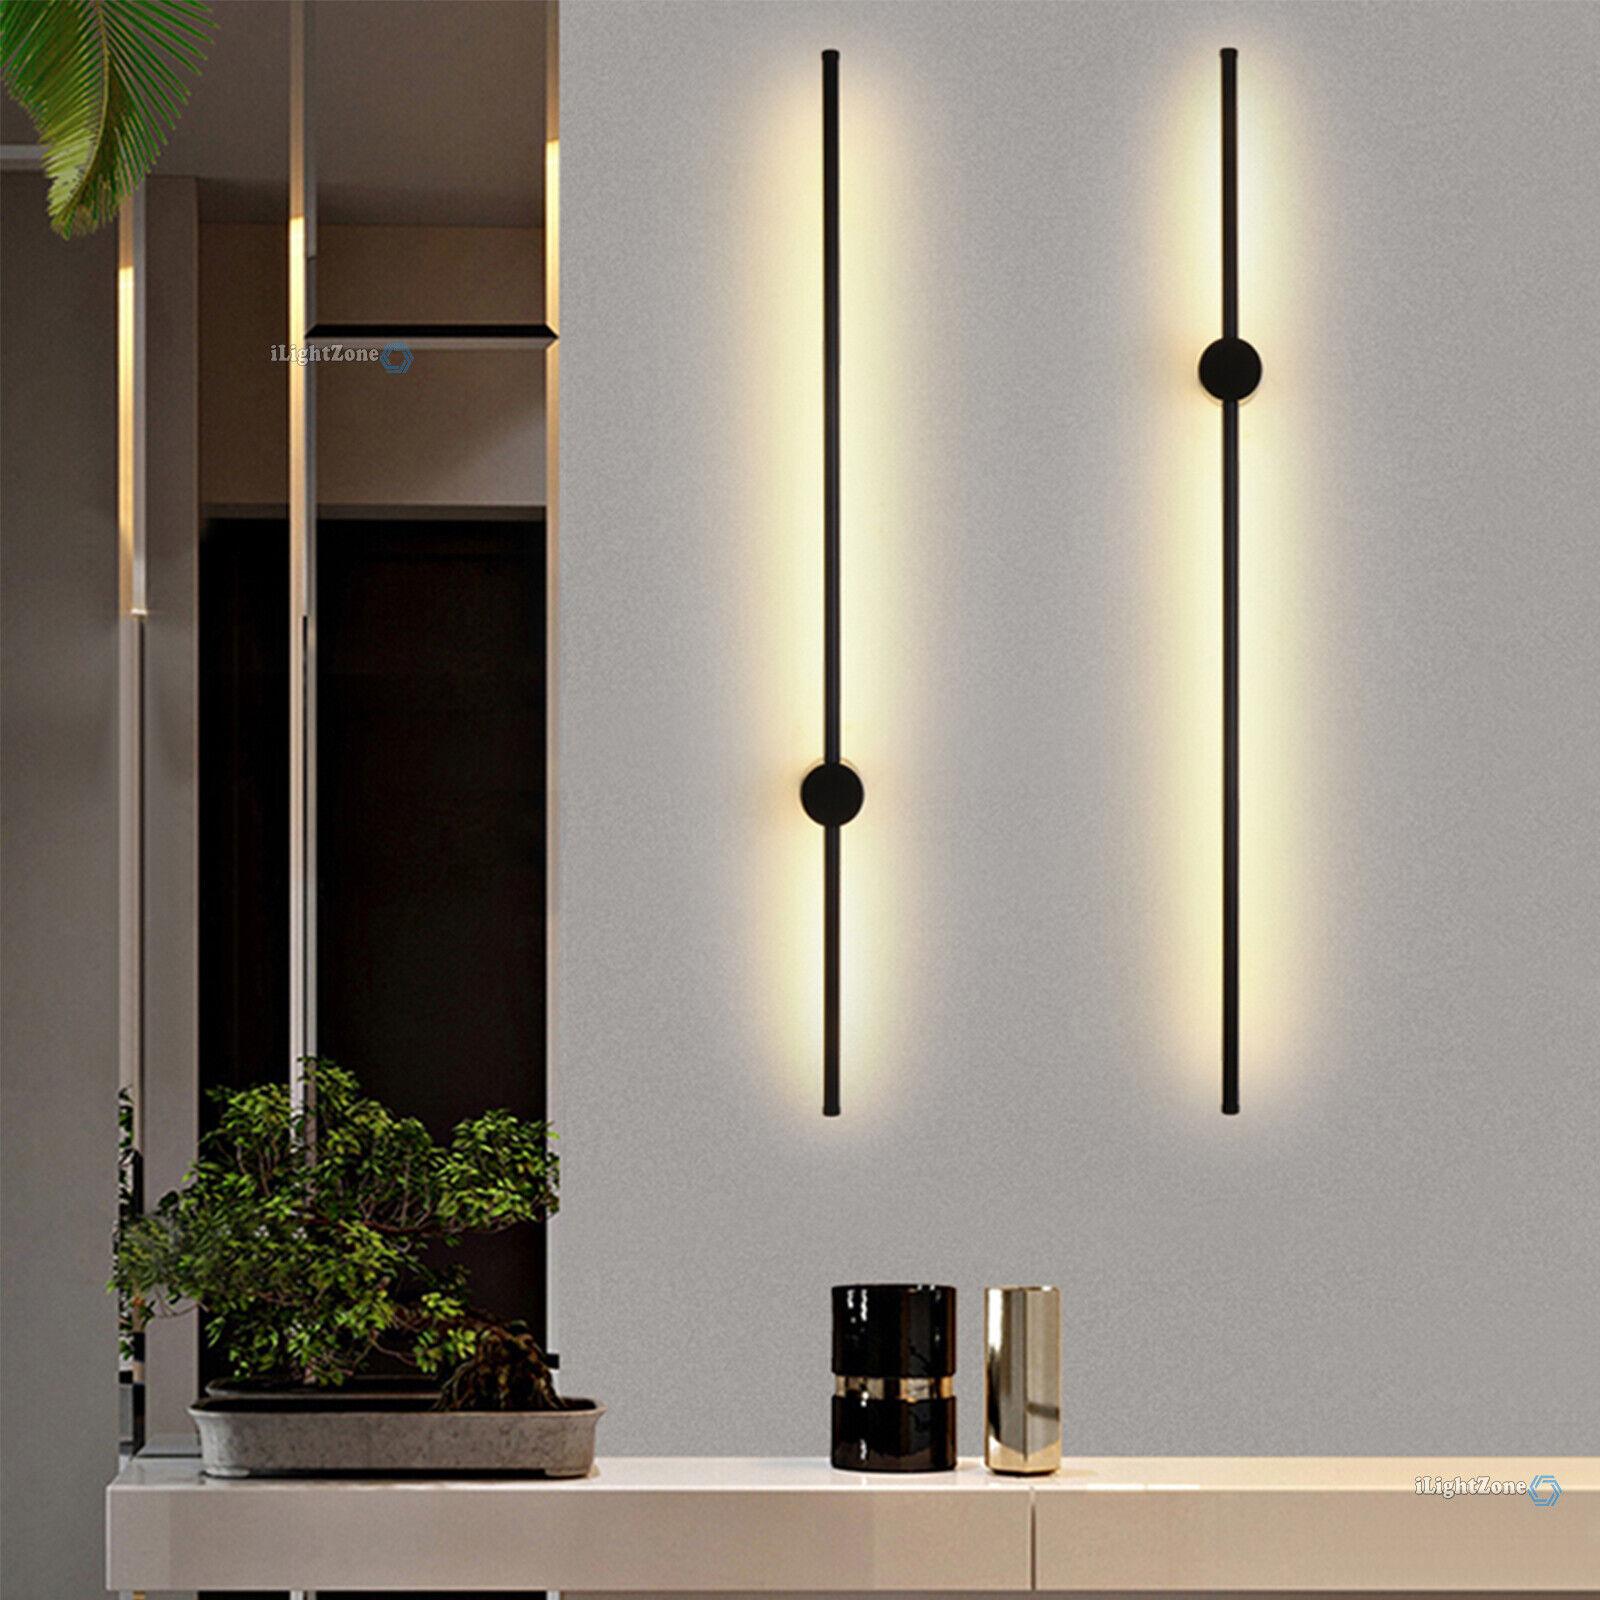 Ikea Santir 0239 Living Room Wall Lighting Uplighter Frosted Glass Shade Lamp For Sale Online Ebay